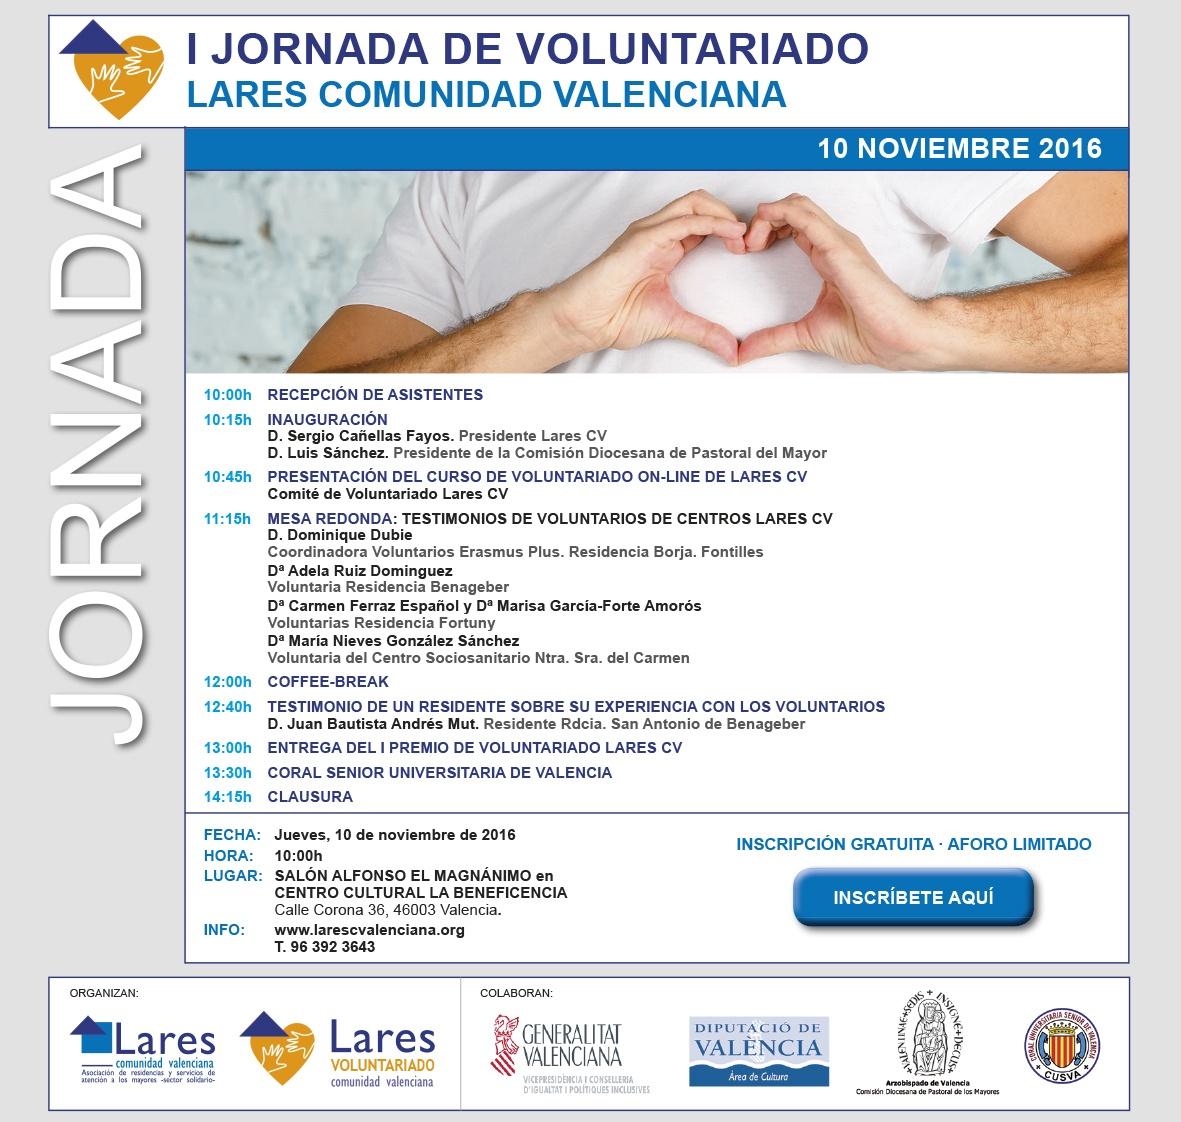 INVITACION JORNADA VOLUNT_7.indd